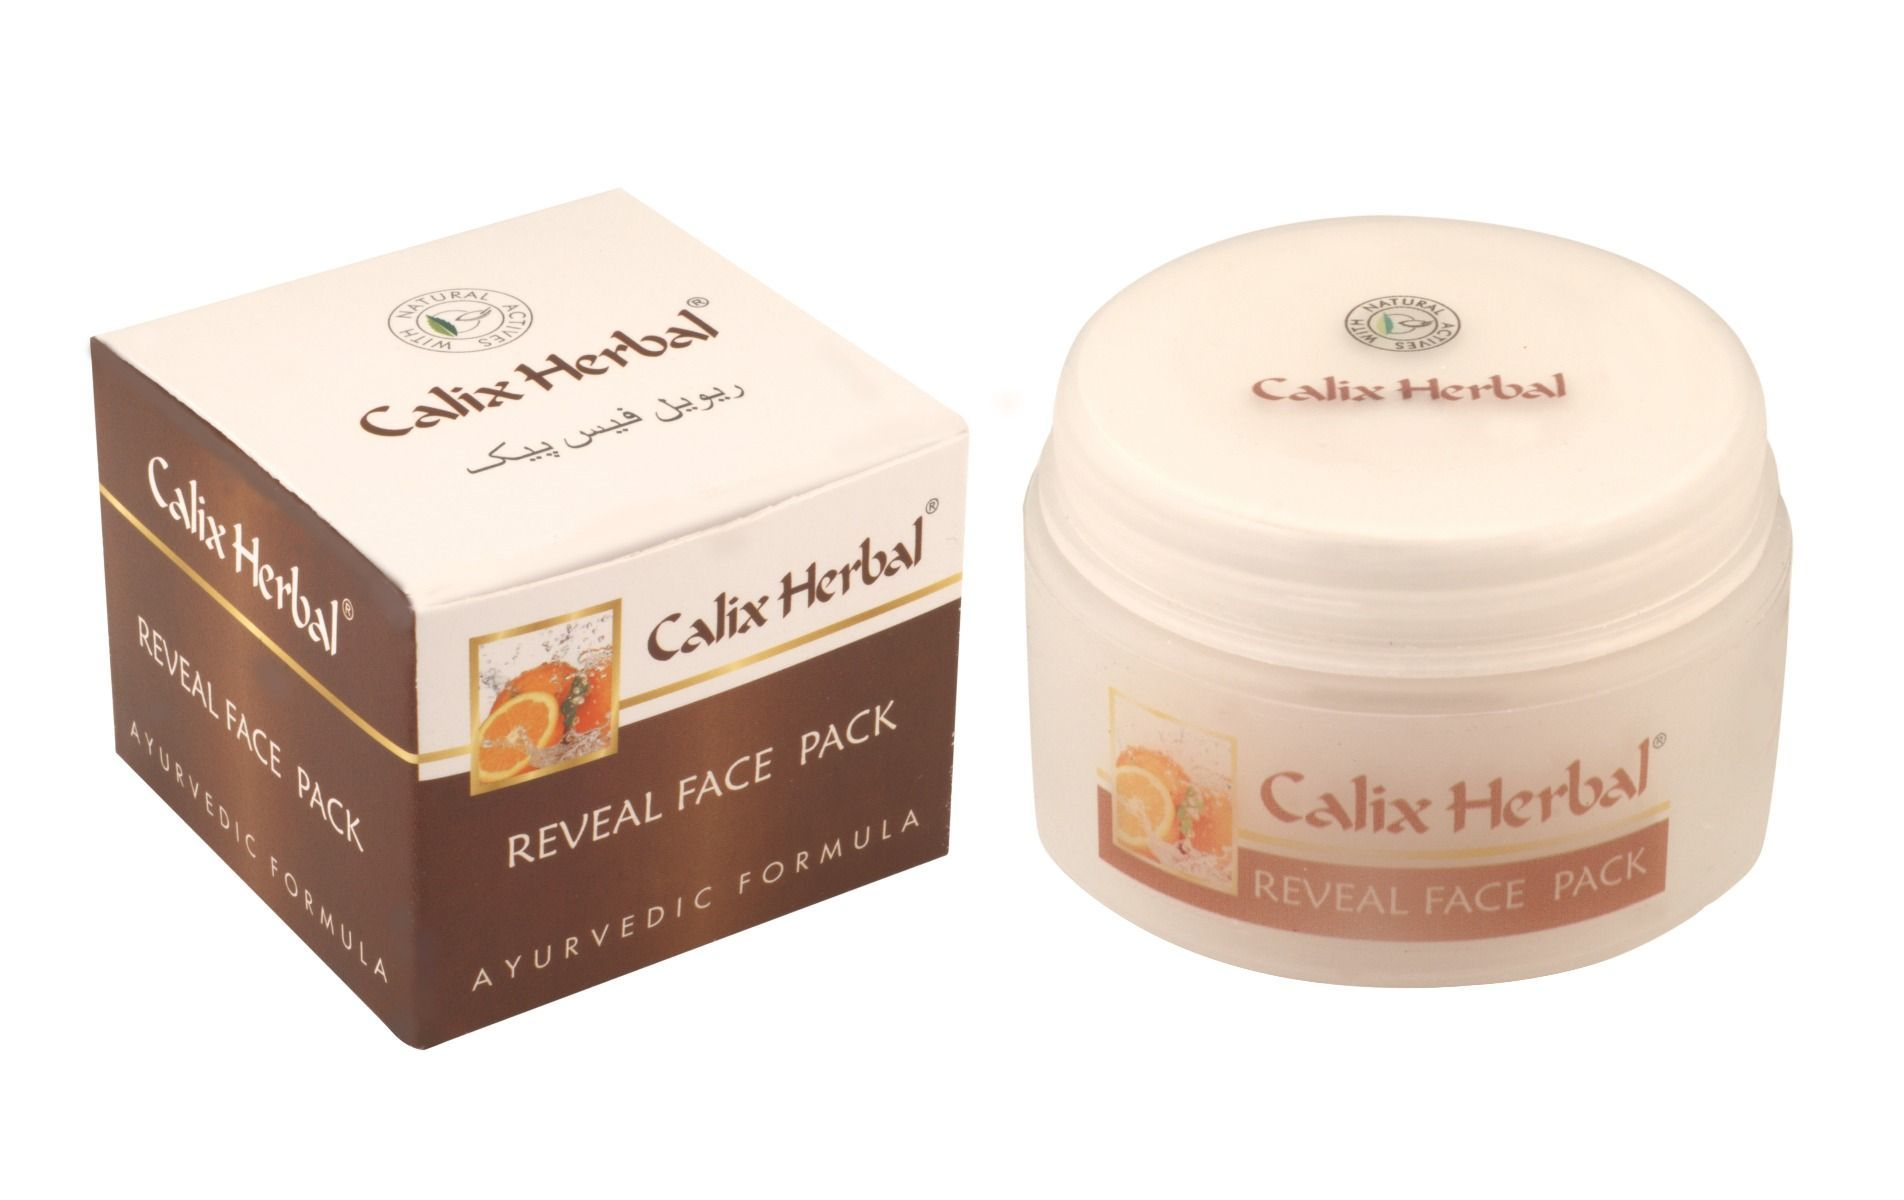 Herbal Reveal Face Pack